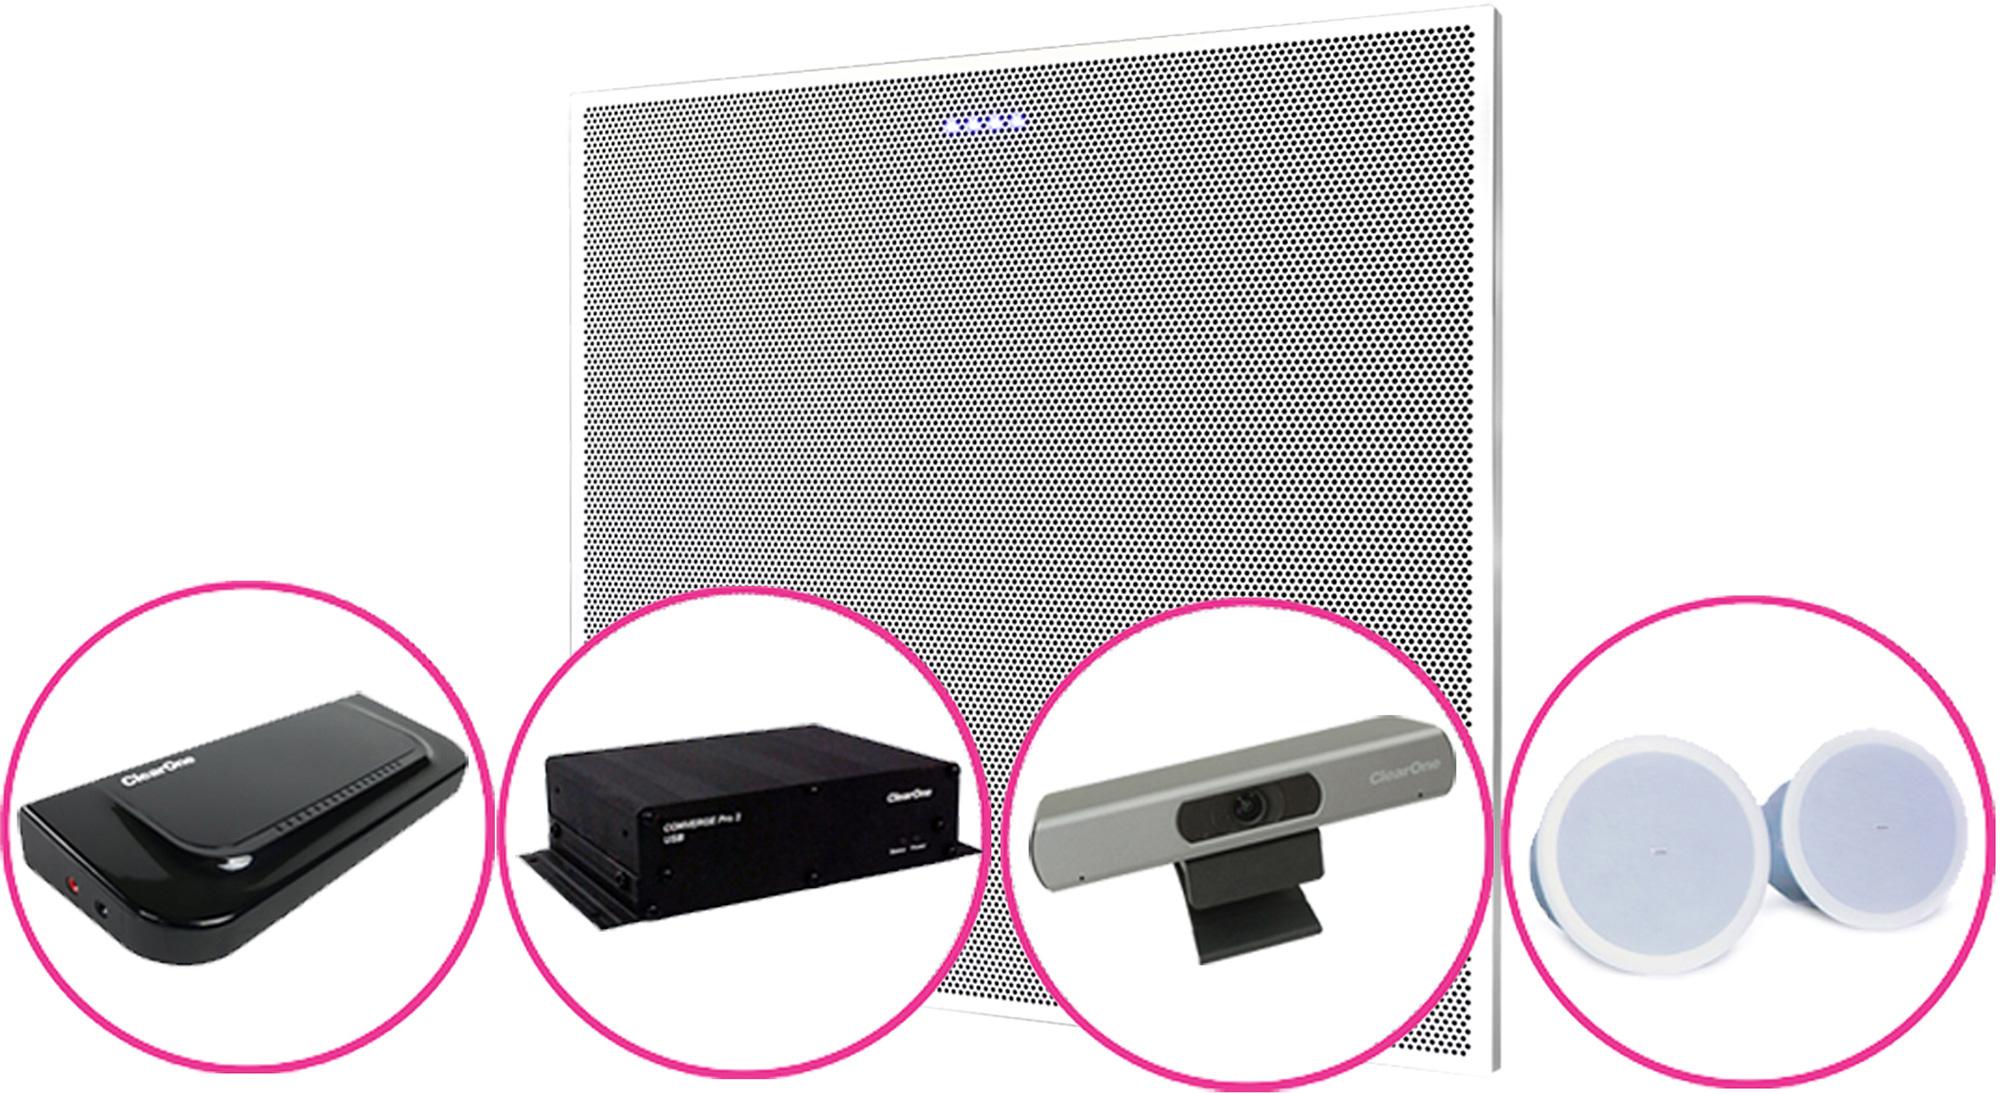 ClearOne COLLABORATE Versa Room CT COLLABORATE Versa Hub & Versa USB/UNITE 50 4K ePTZ Camera/Ceiling Loudspeaker CL1-930-3200-020